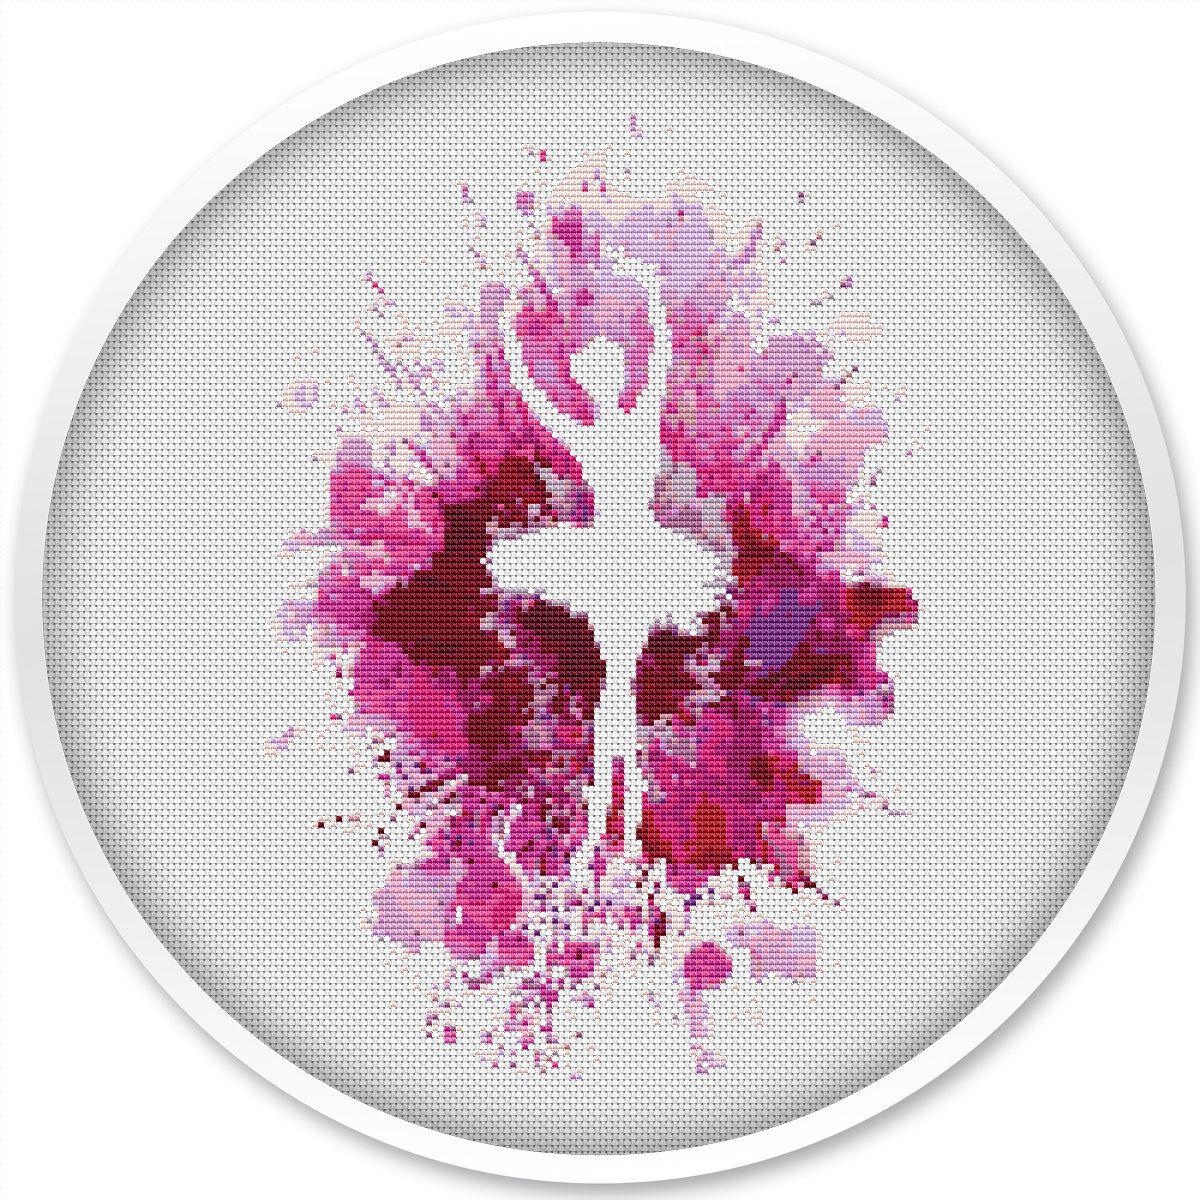 Ballerina Cross Stitch Pattern Free Shipping Watercolor Cross